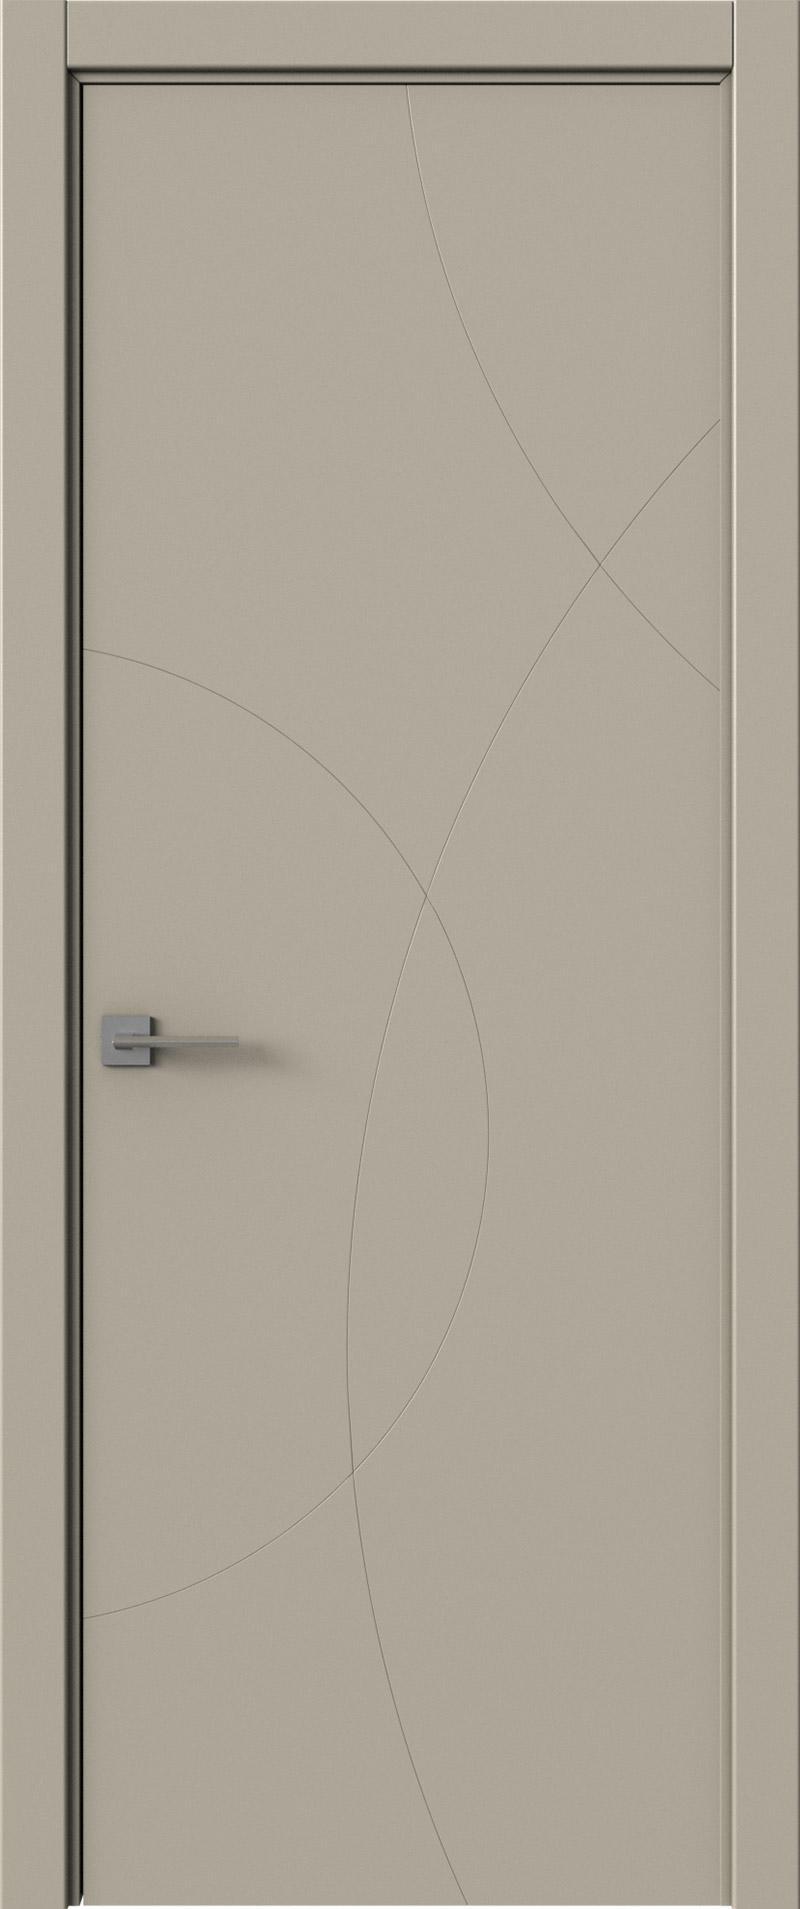 Tivoli Б-5 цвет - Серо-оливковая эмаль (RAL 7032) Без стекла (ДГ)